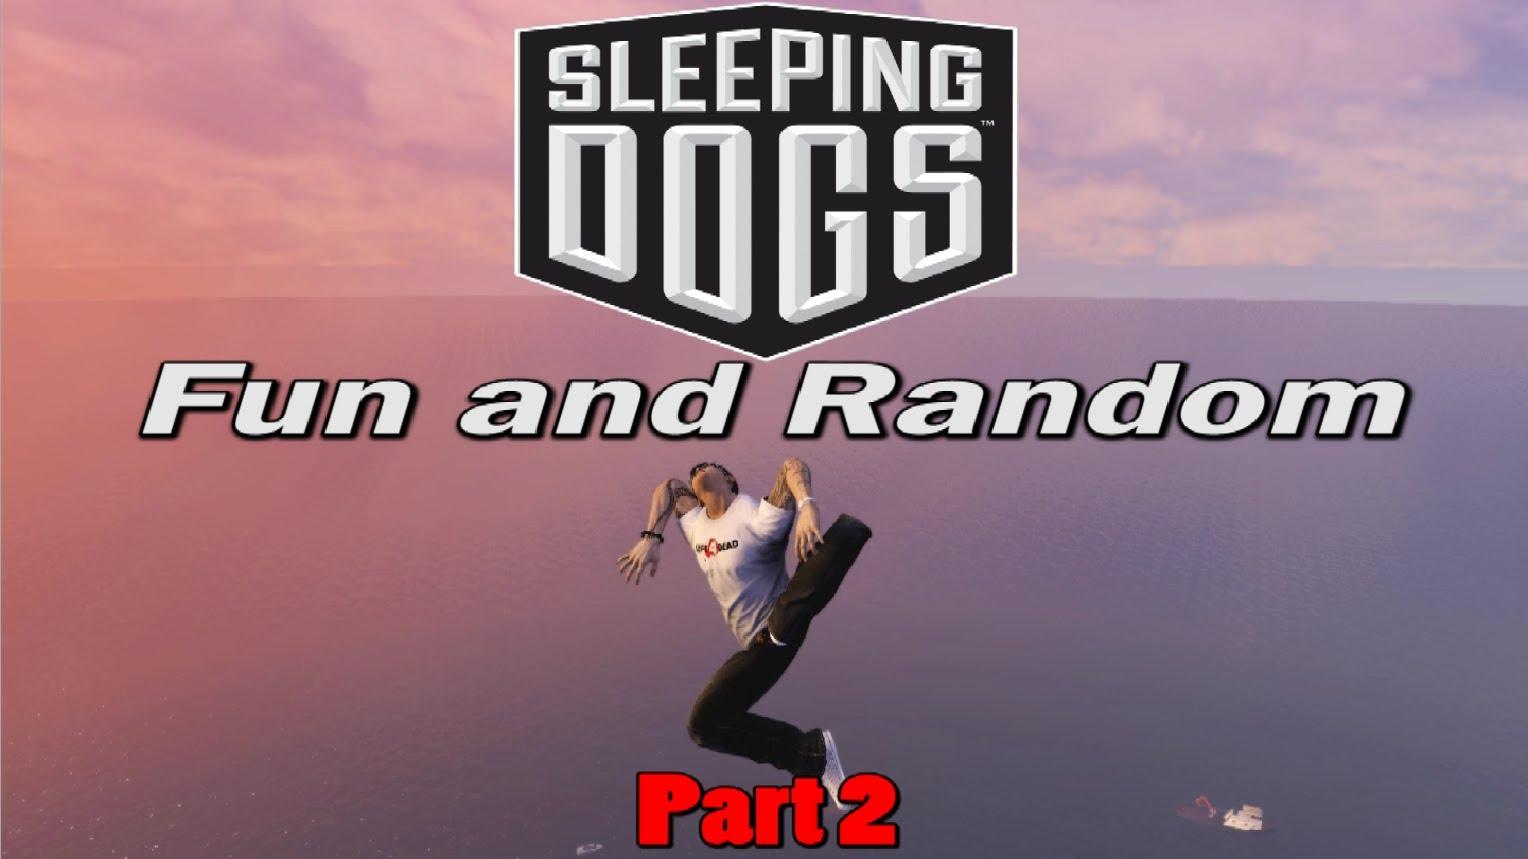 Sleeping Dogs: Fun and Random